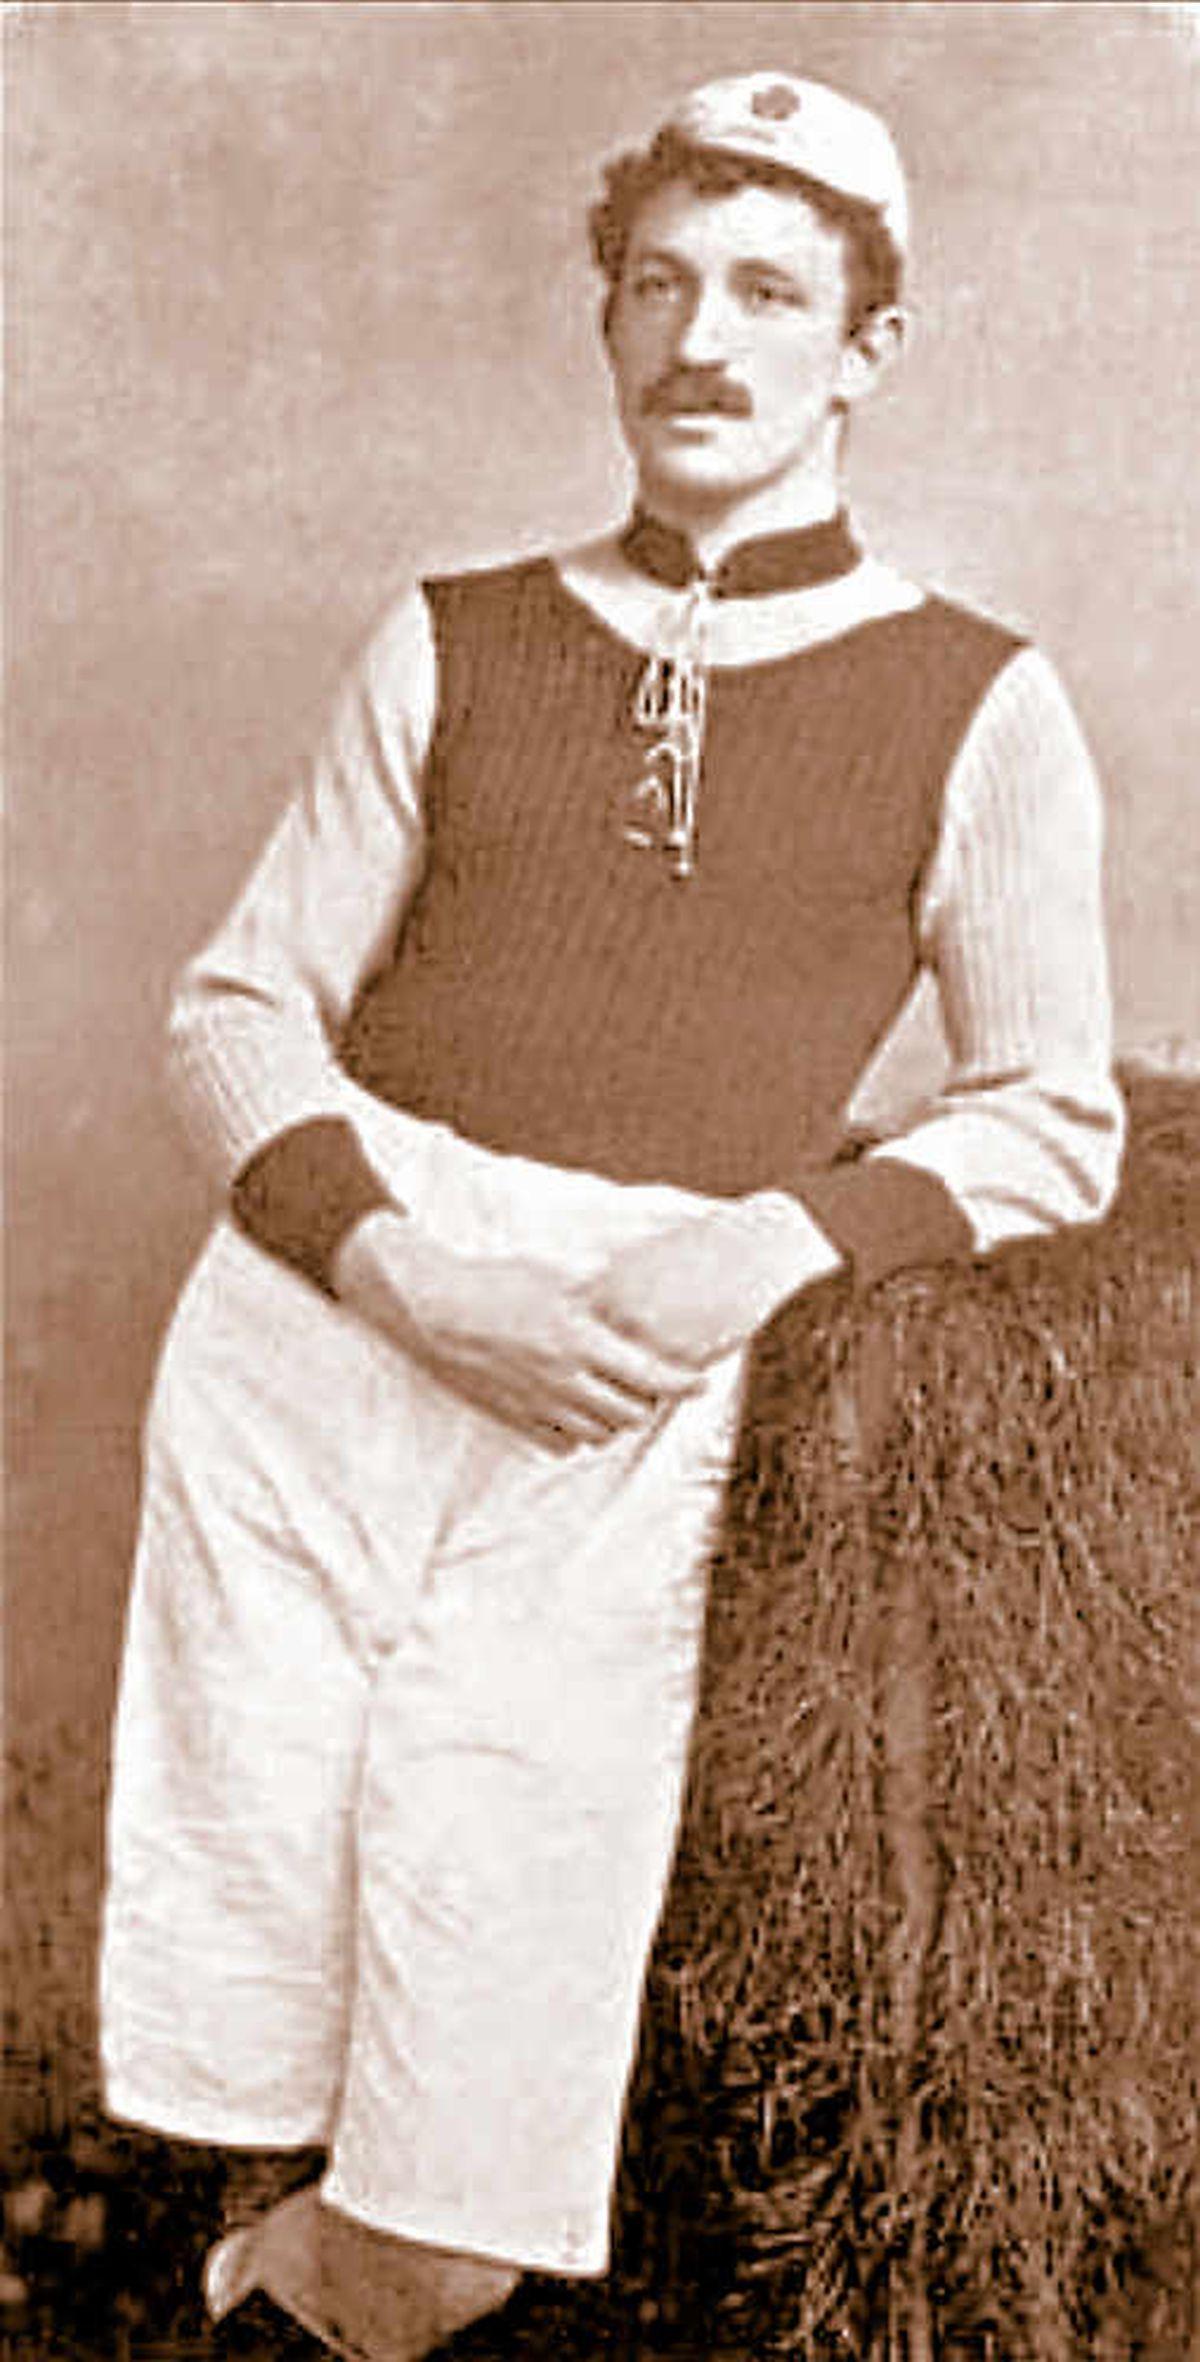 Aston Villa player Charlie Athersmith